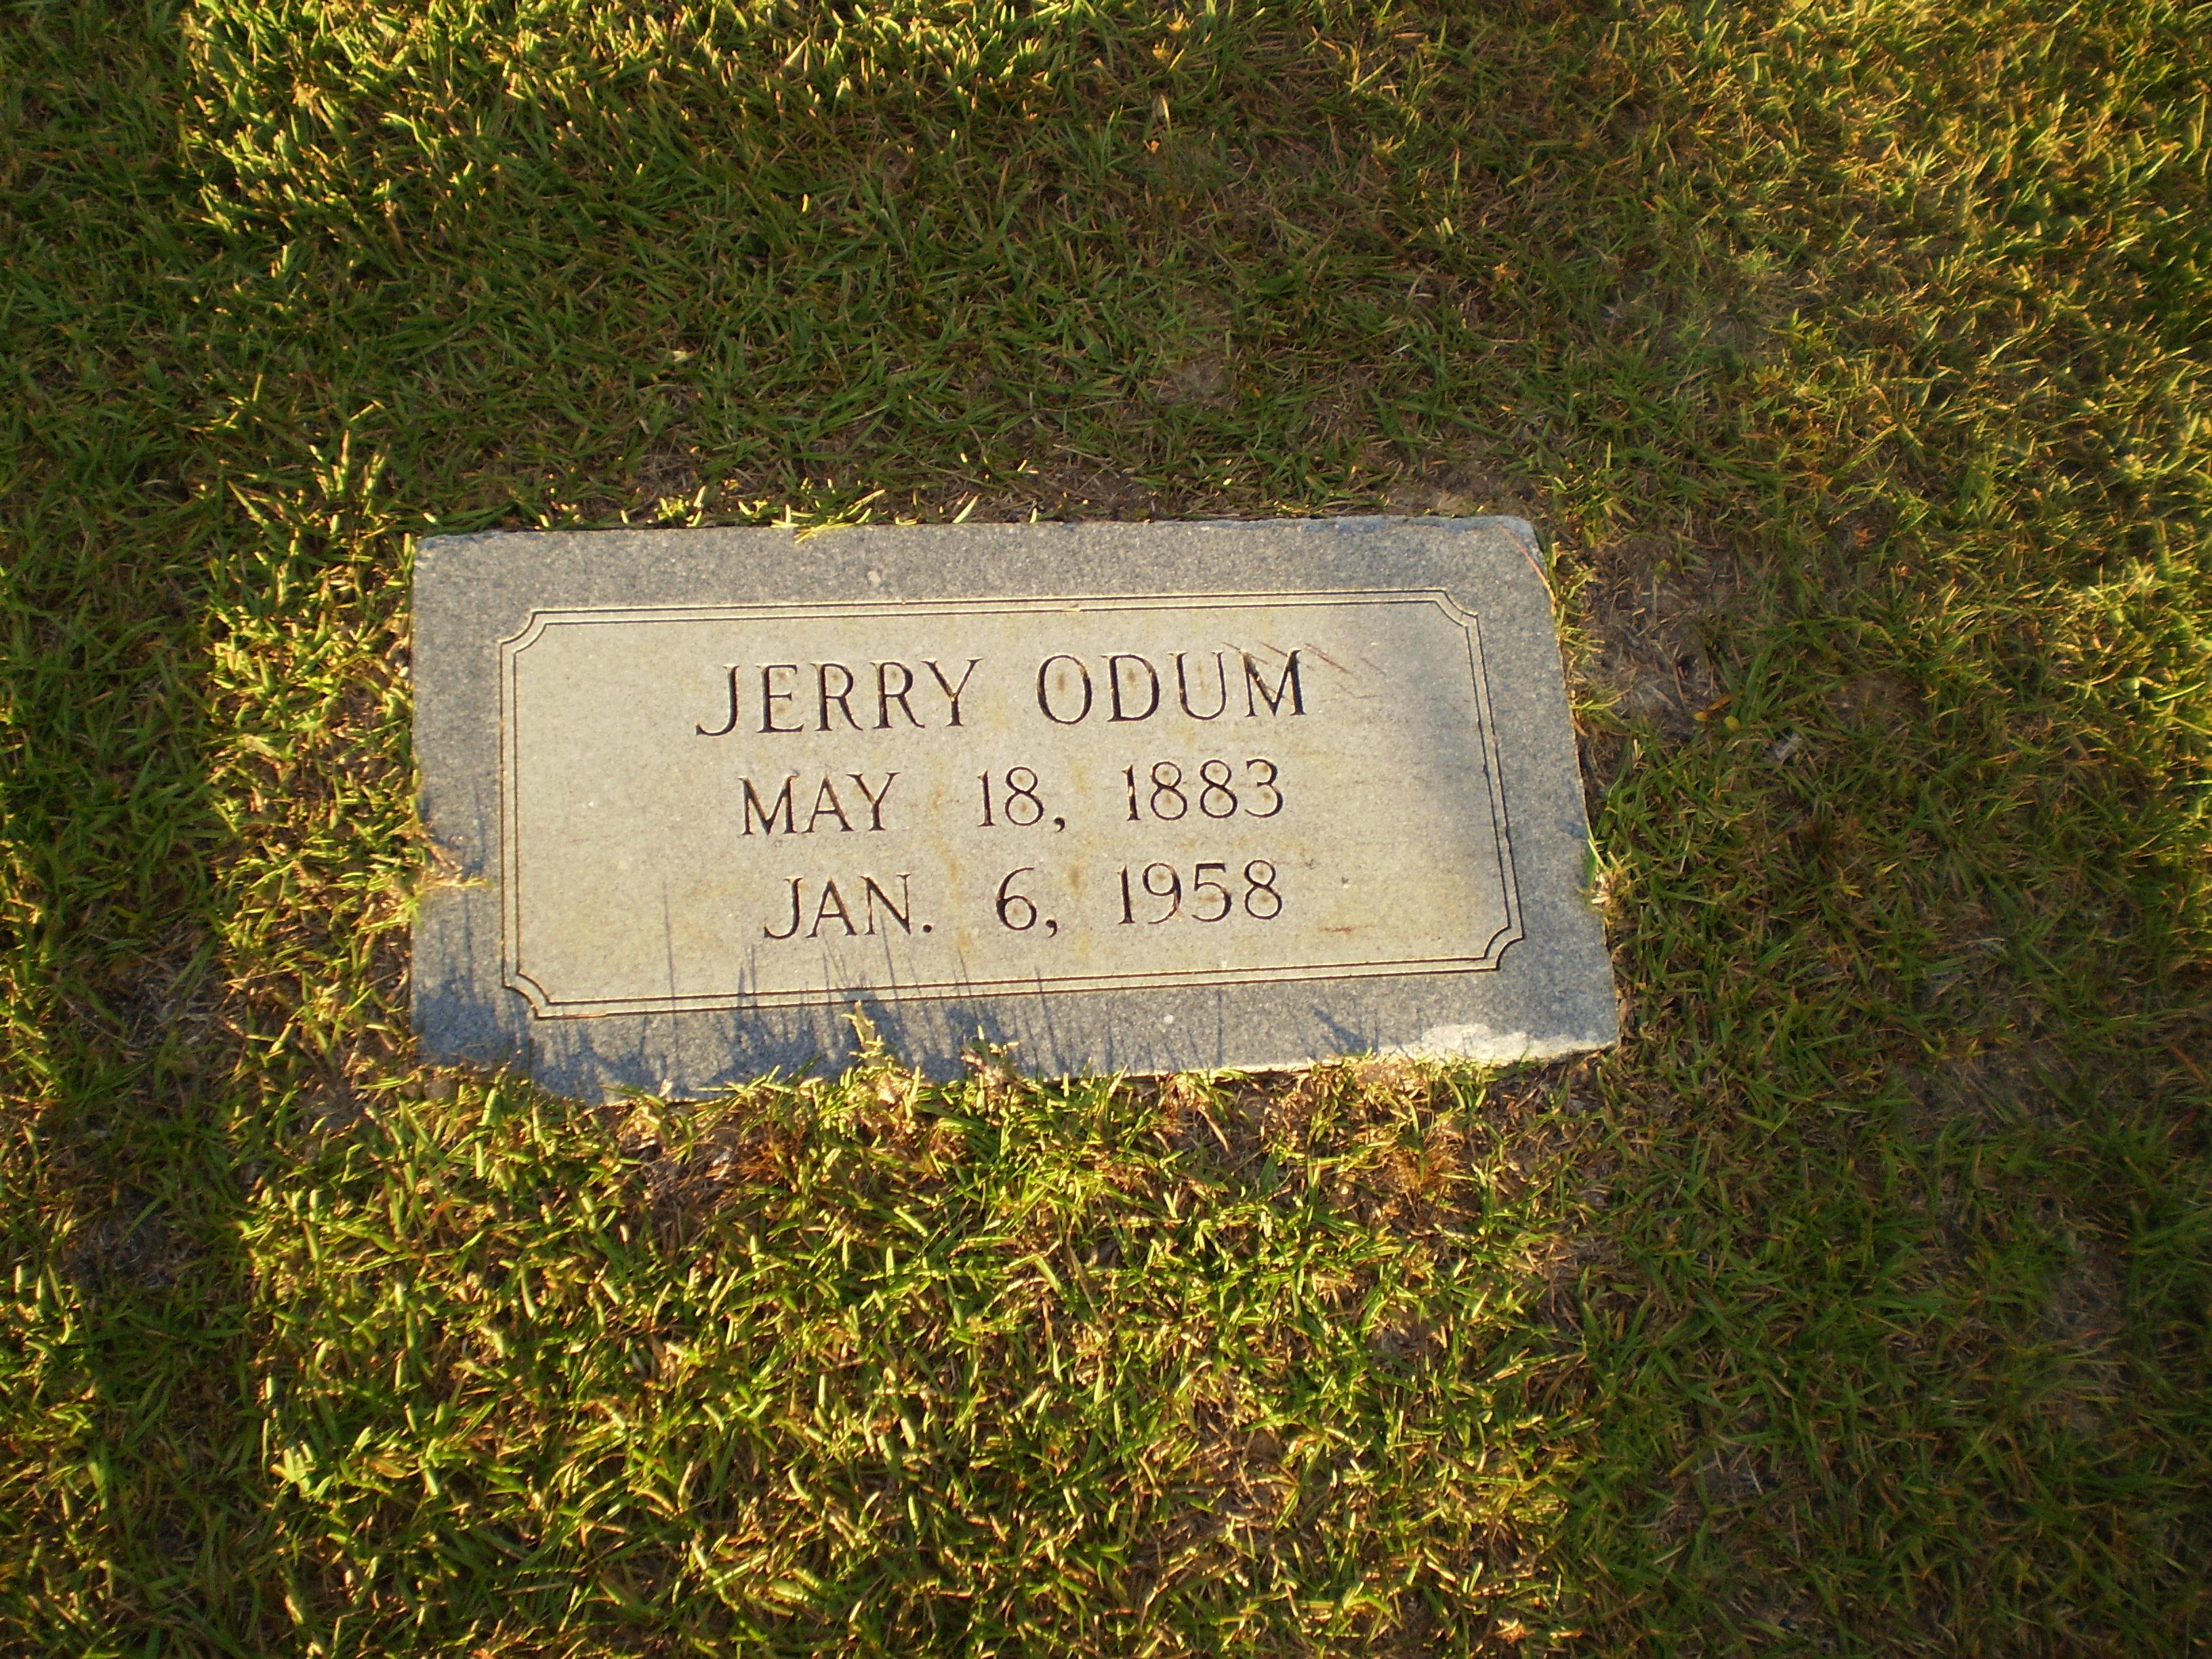 Jerry Odum